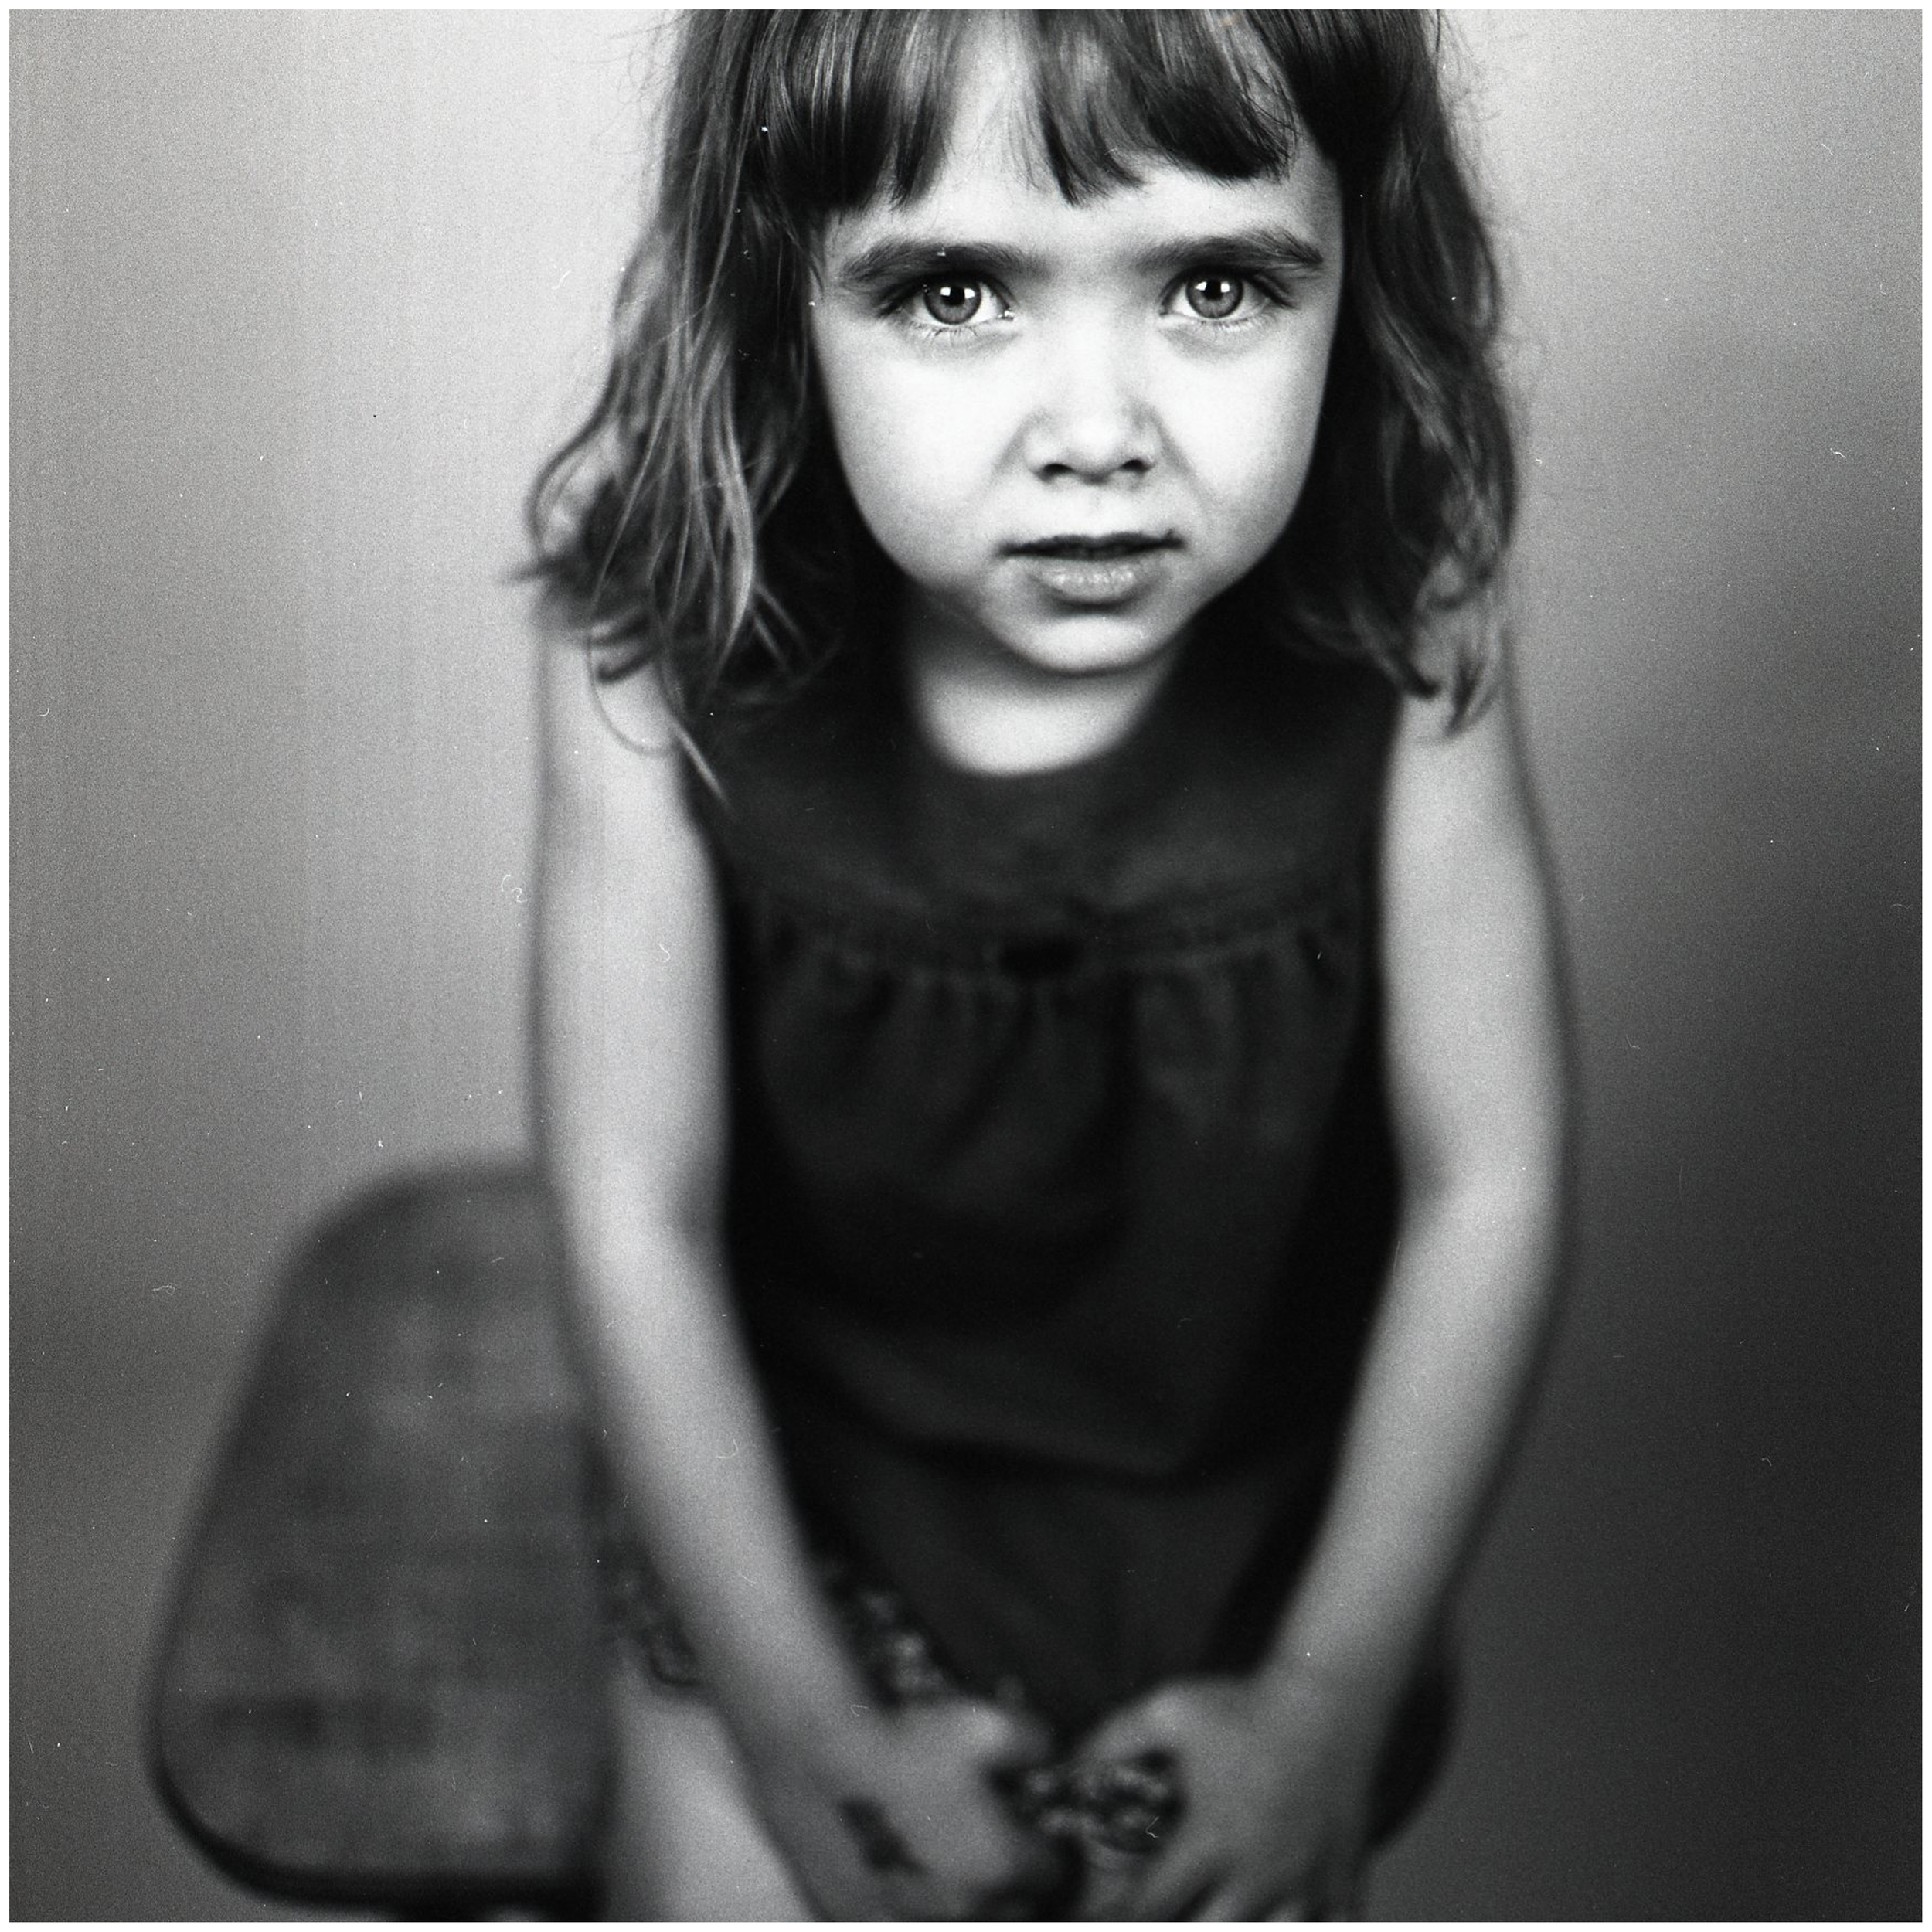 portraits003resized.jpg